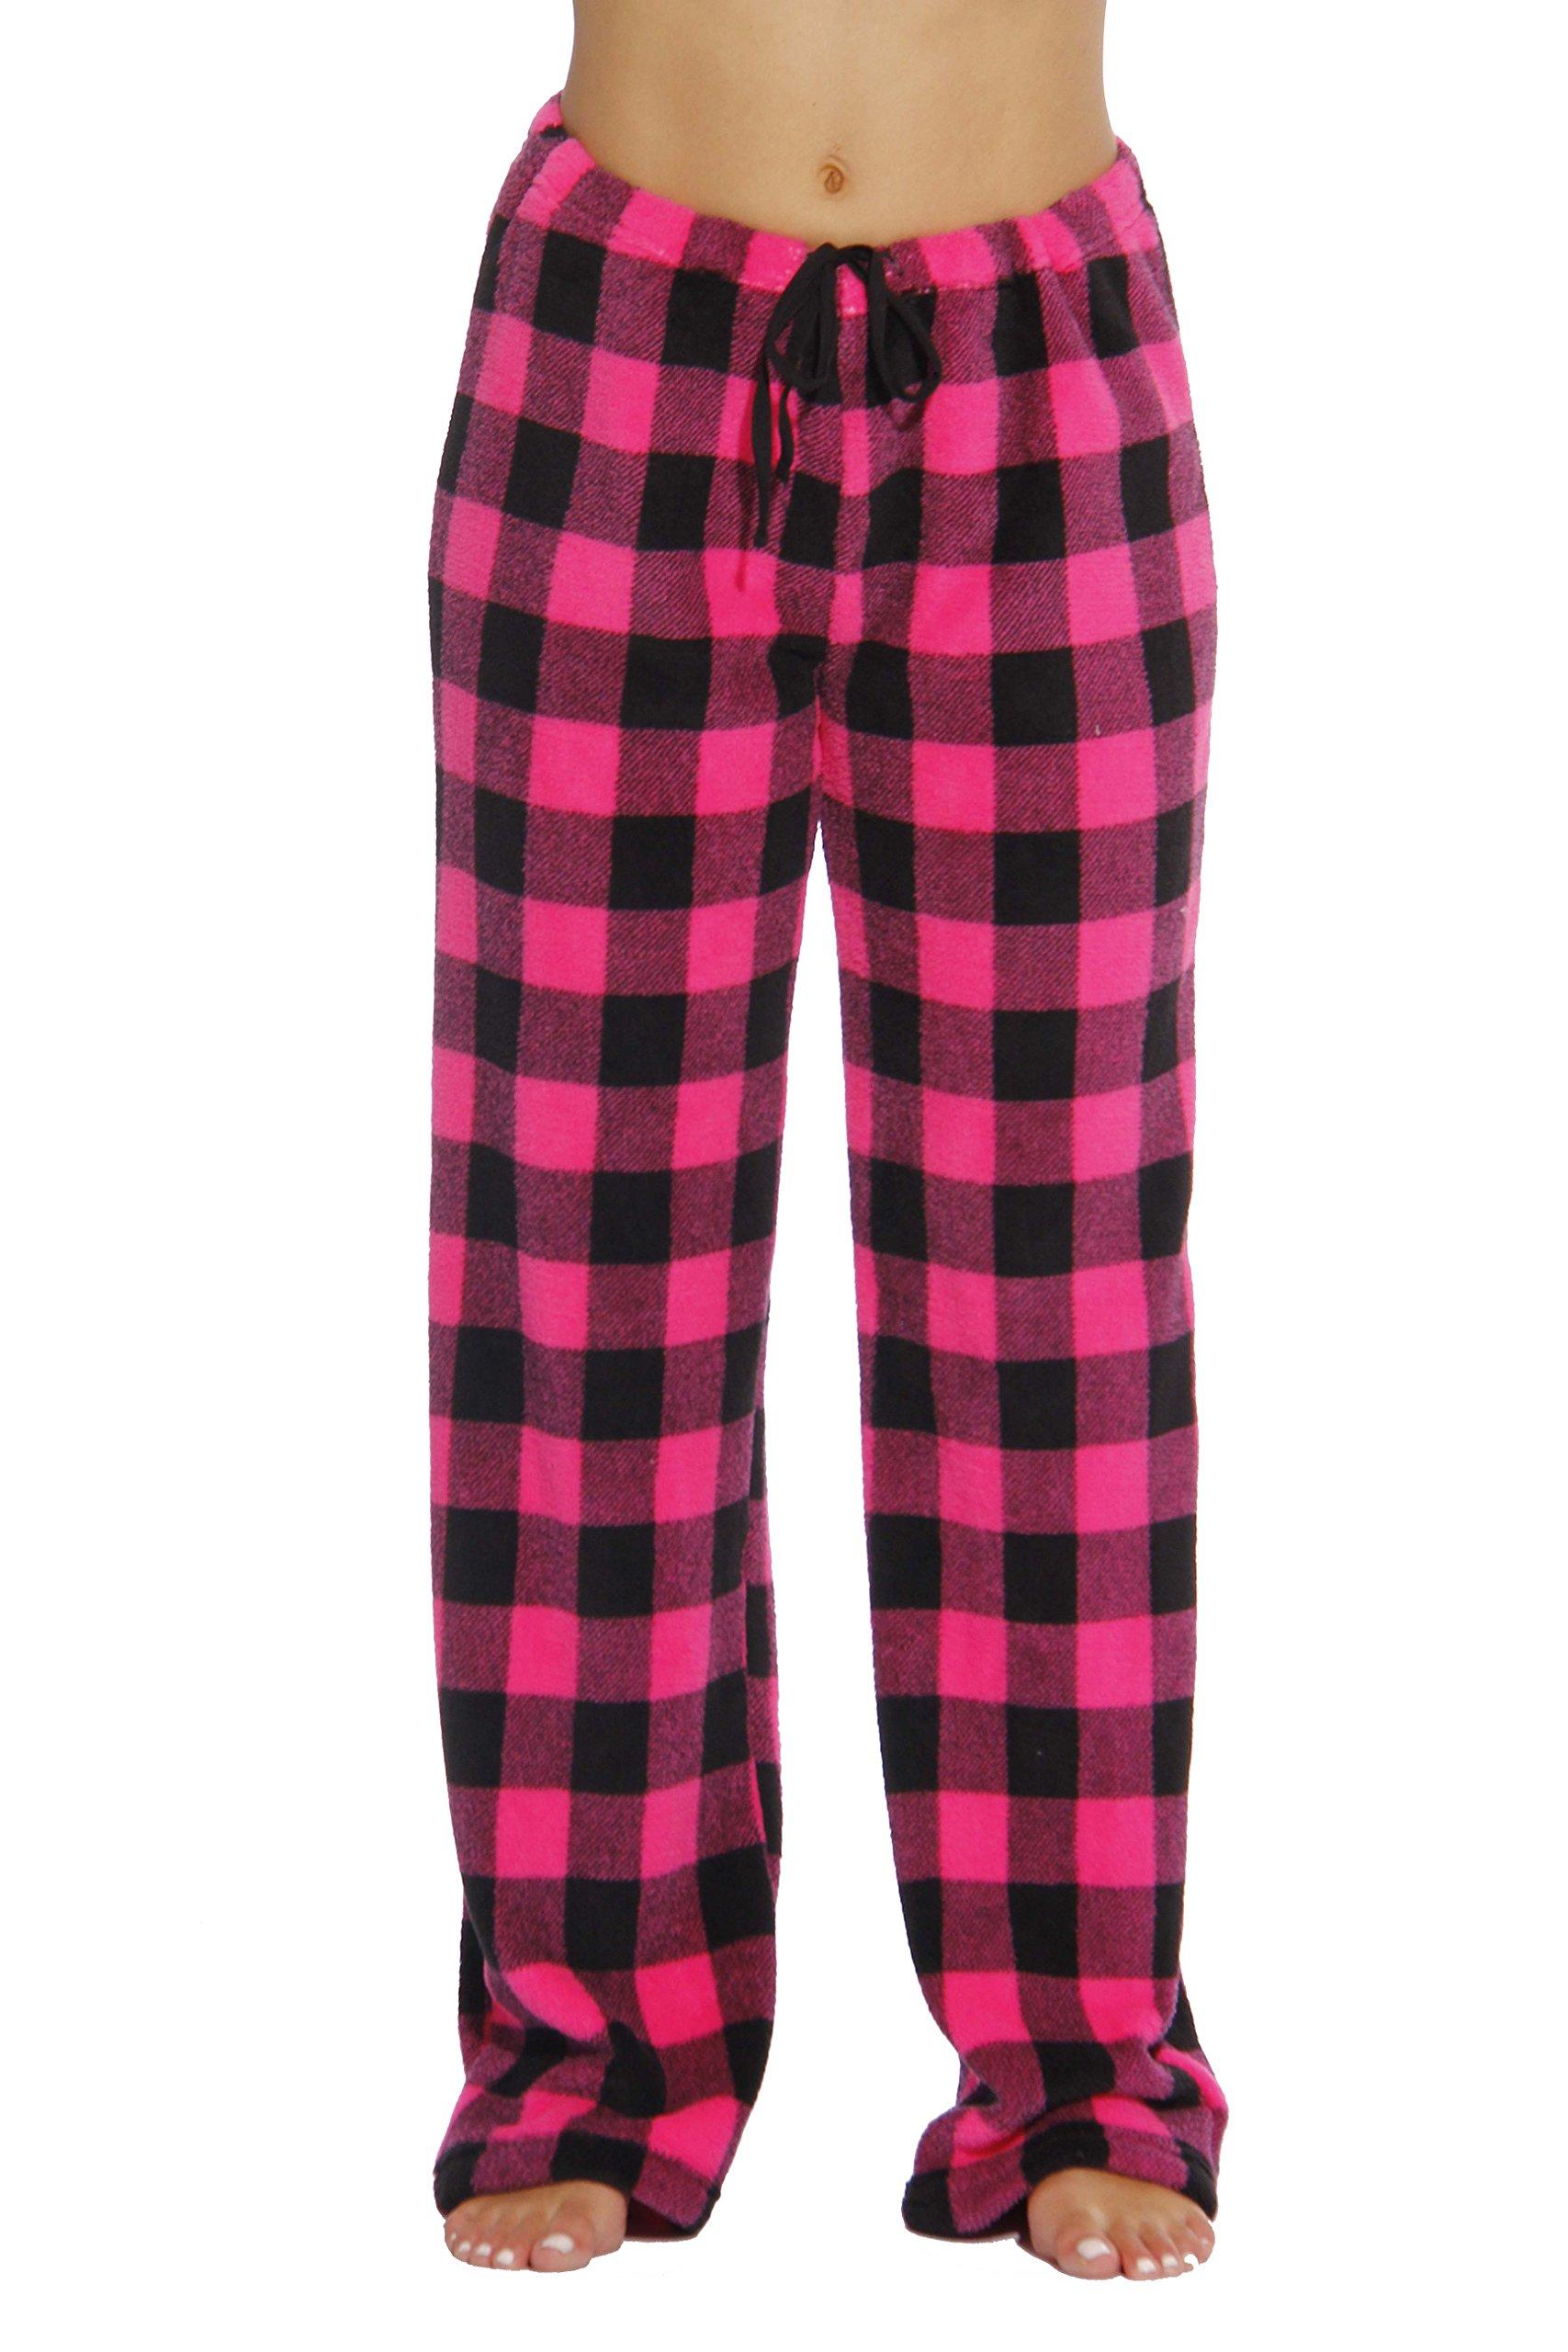 Just Love Women's Buffalo Plaid Plush Check Pajama Pants, Buffalo Plaid Fuchsia / Black, Small